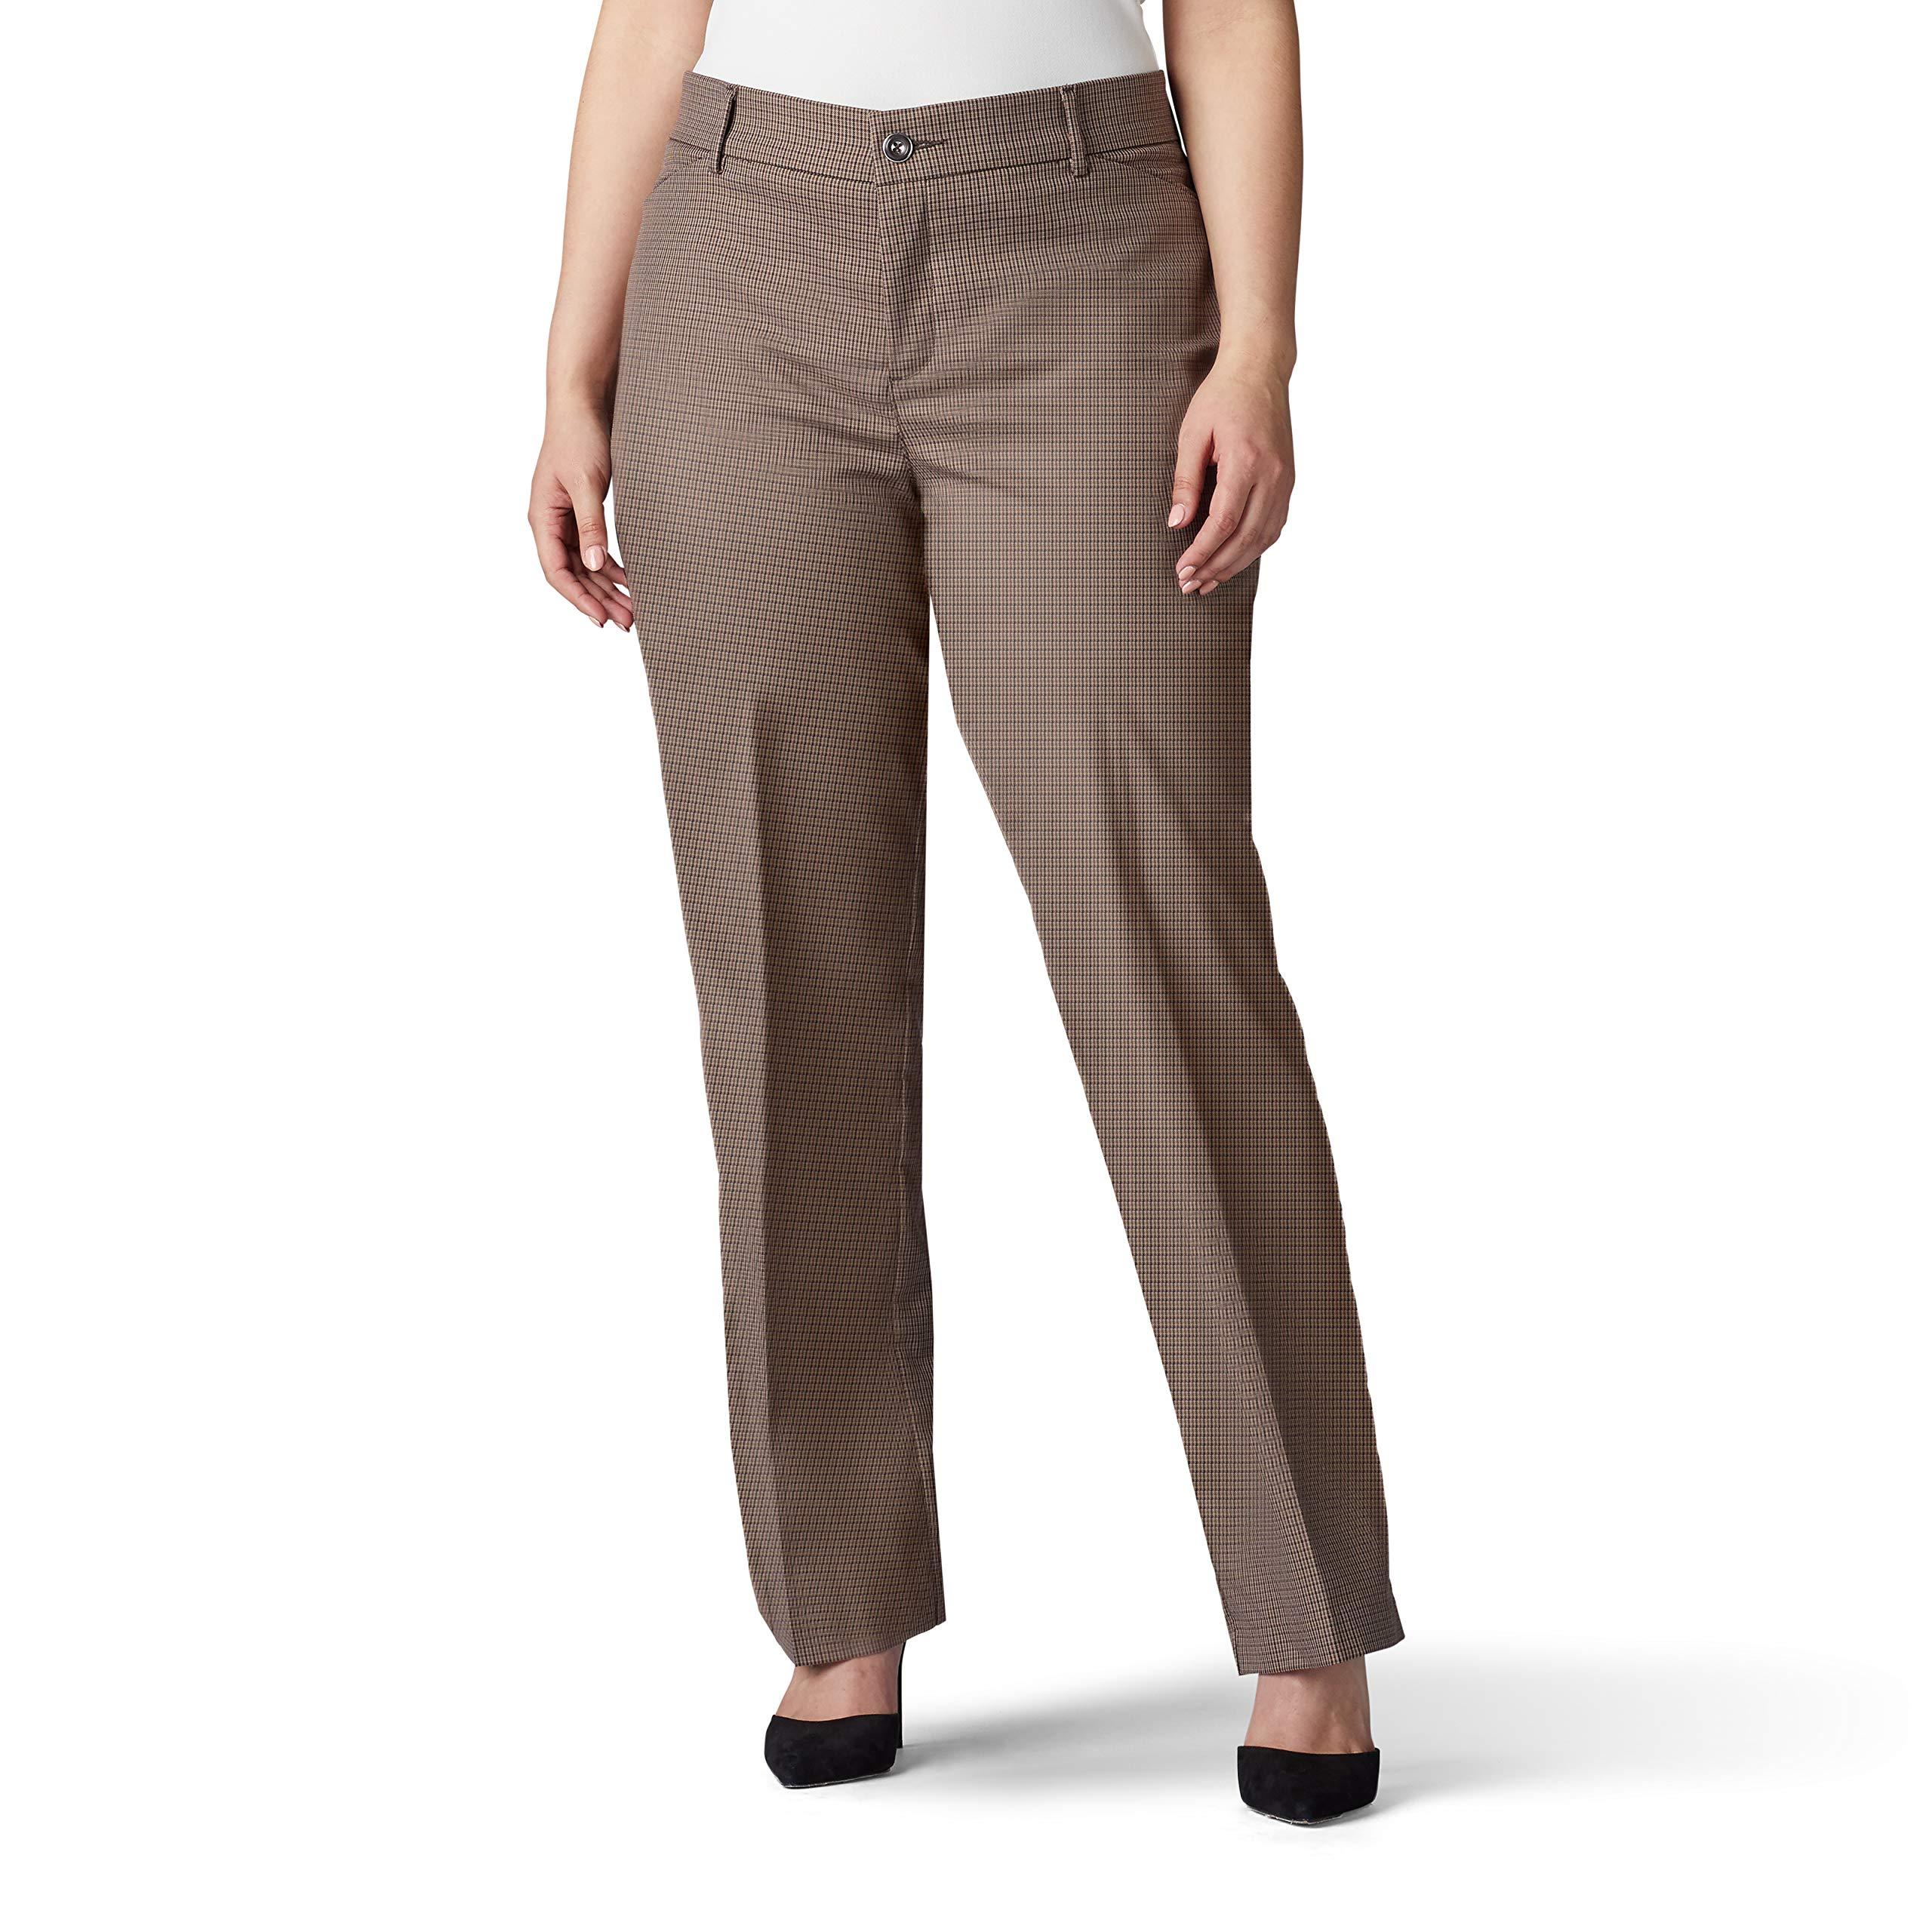 LEE Women's Plus Size Flex Motion Regular Fit Trouser Pant, deep Breen Austin Check, 16W Petite by LEE